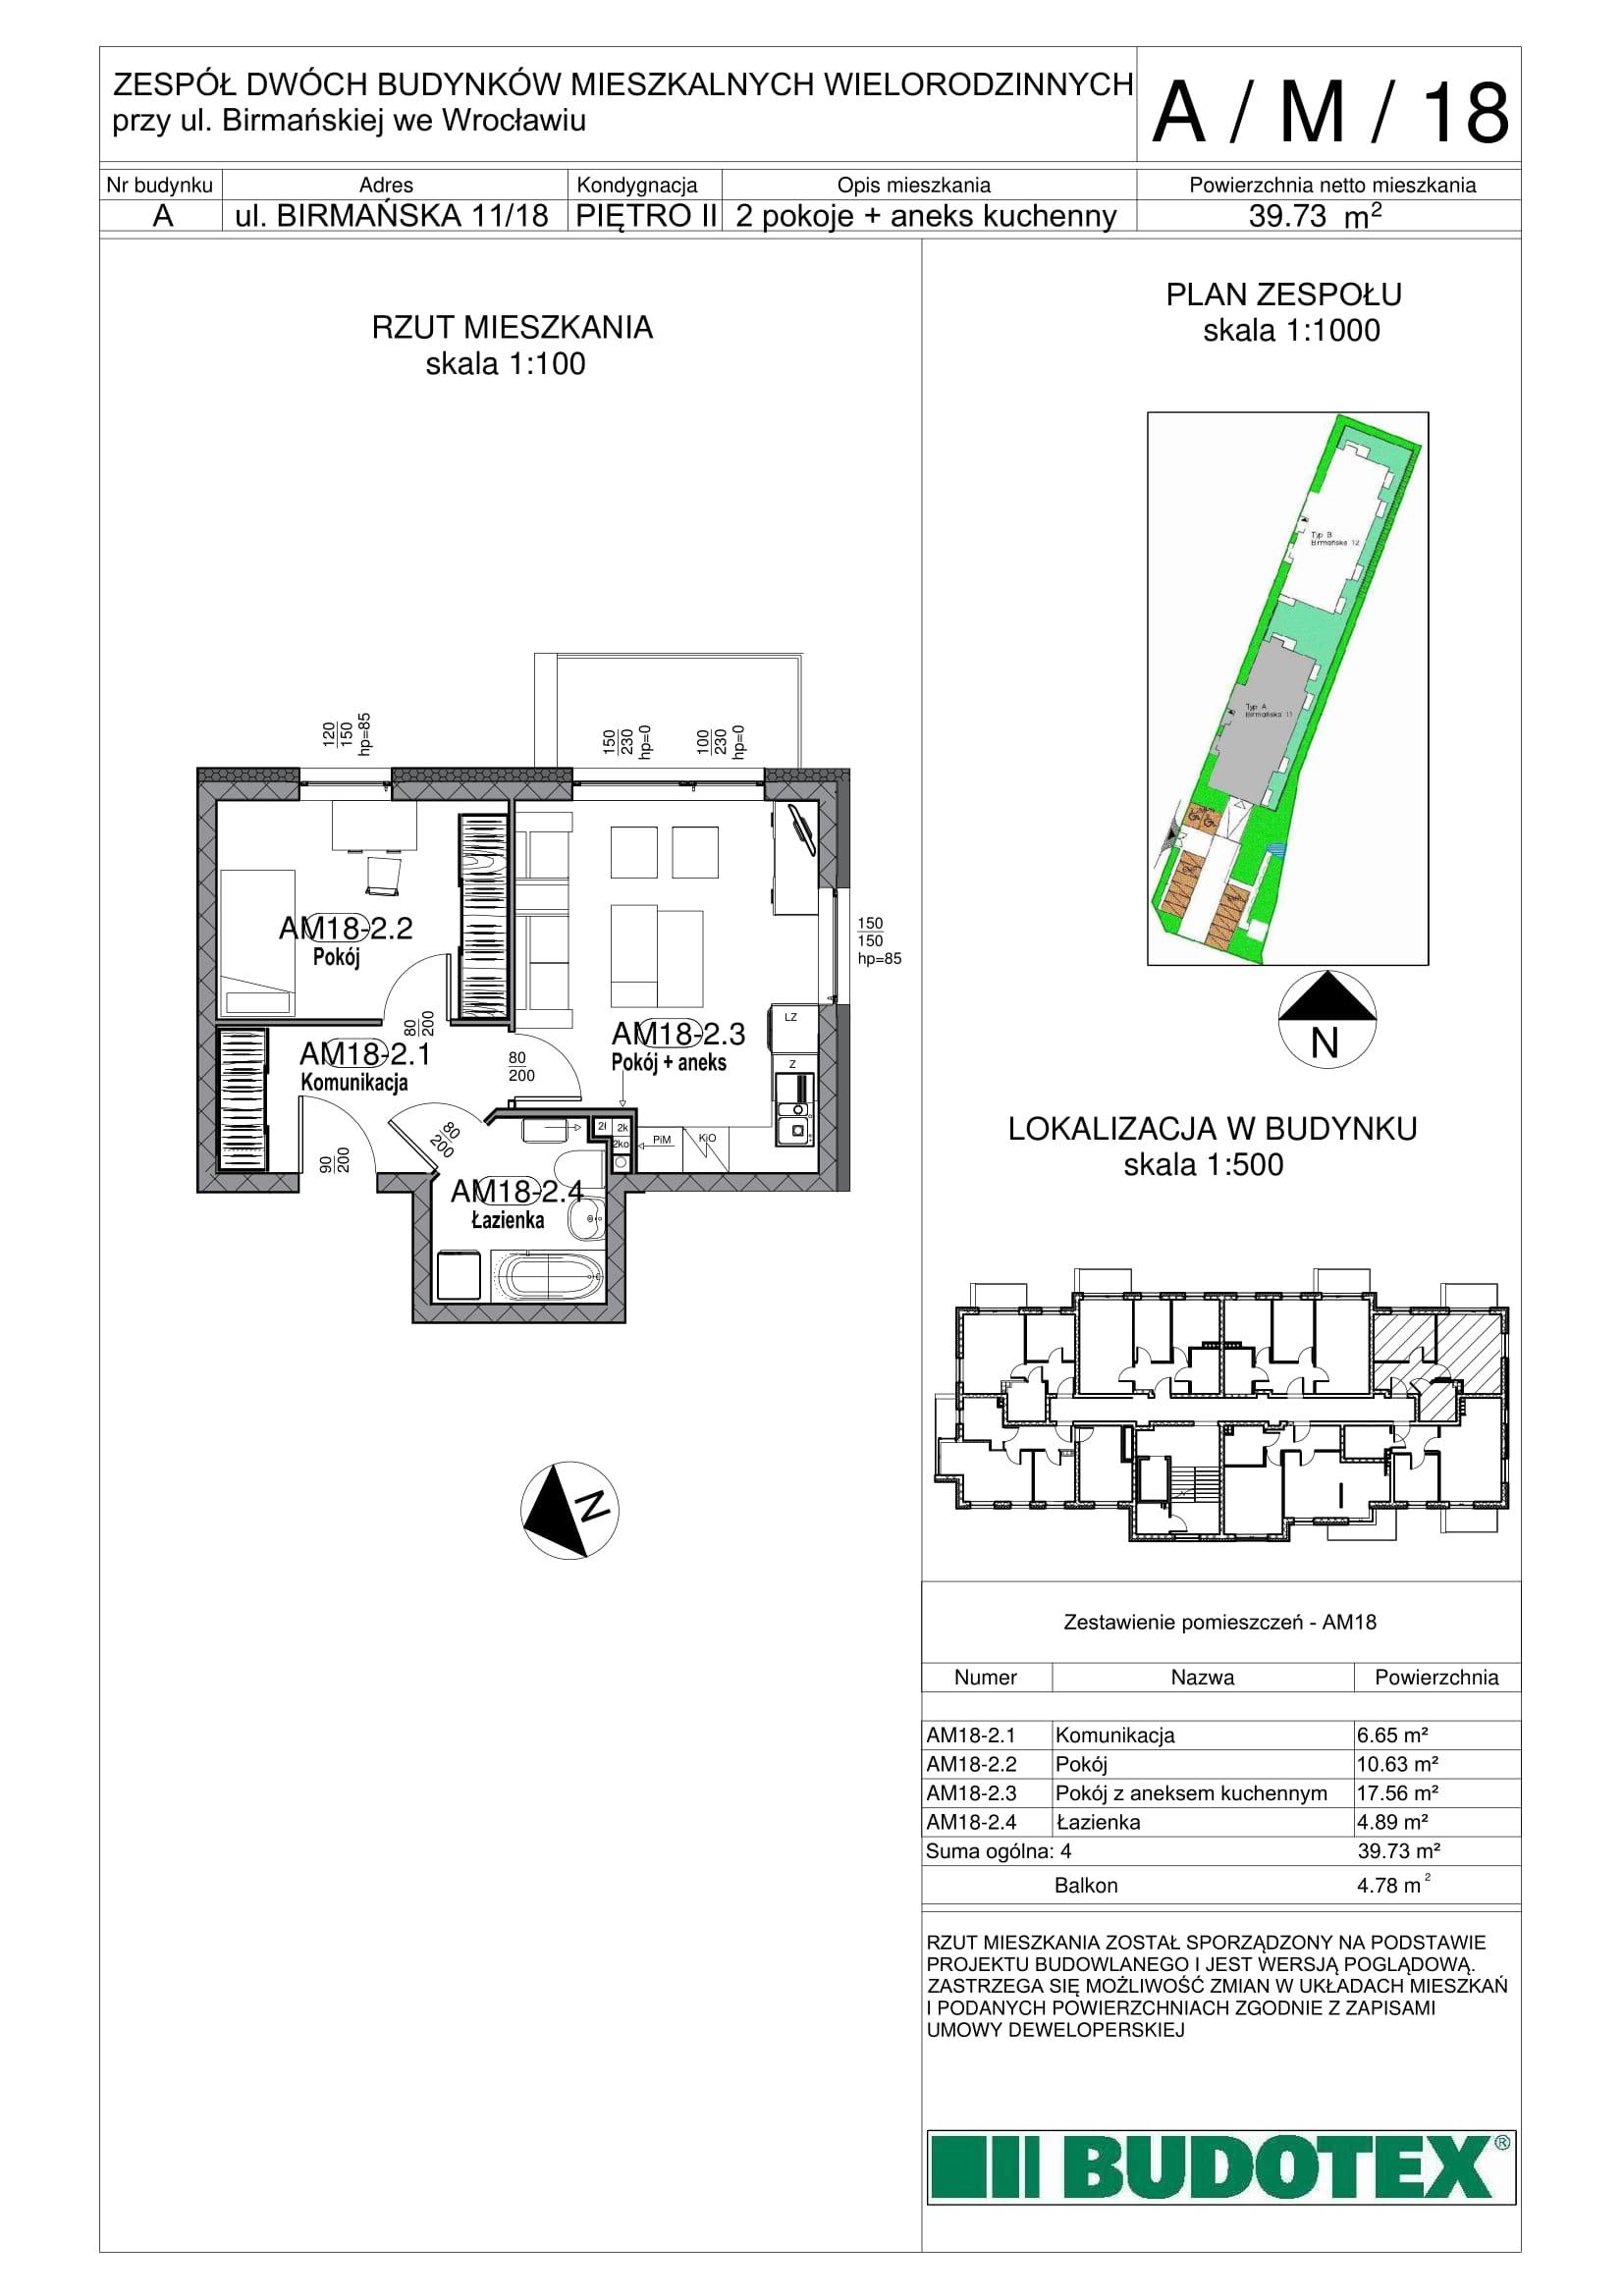 Mieszkanie nr A/M/18